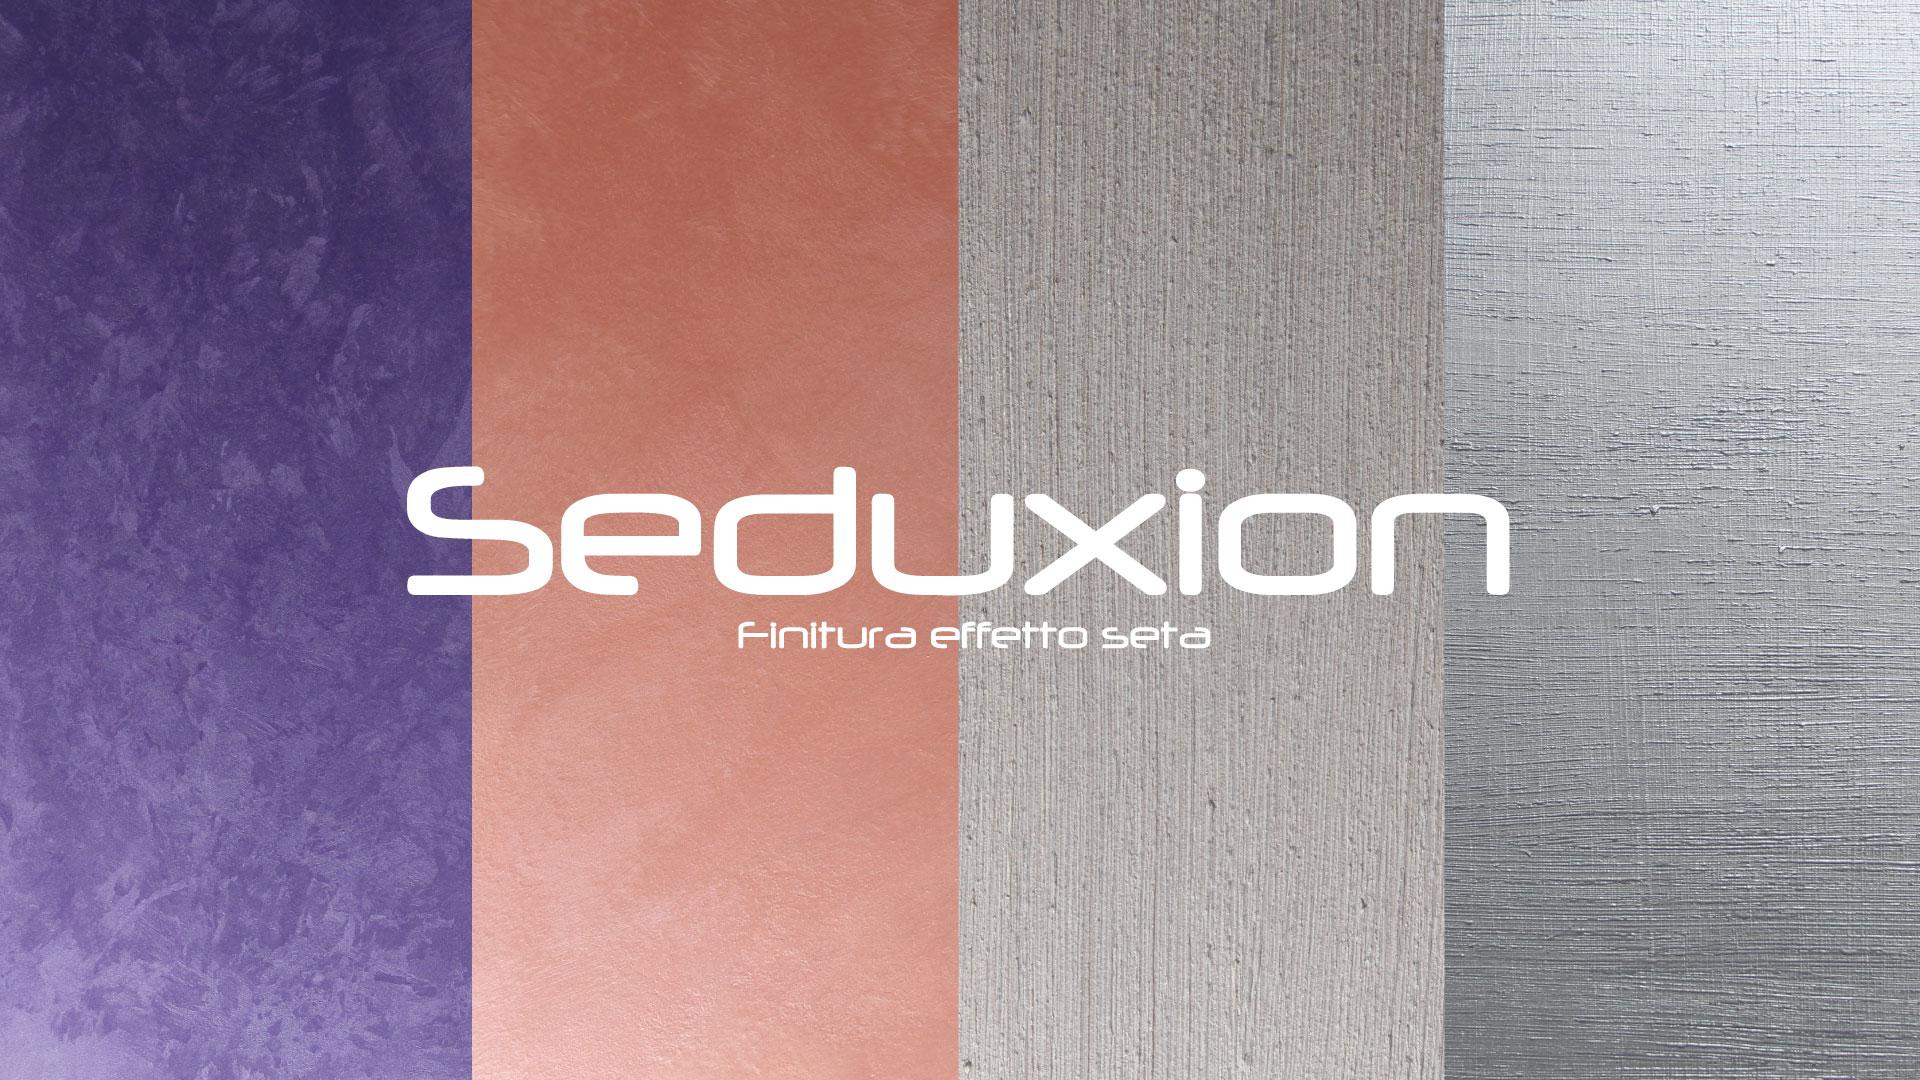 Pittura Pareti Effetto Seta : Seduxion pittura decorativa effetto seta rives colors and